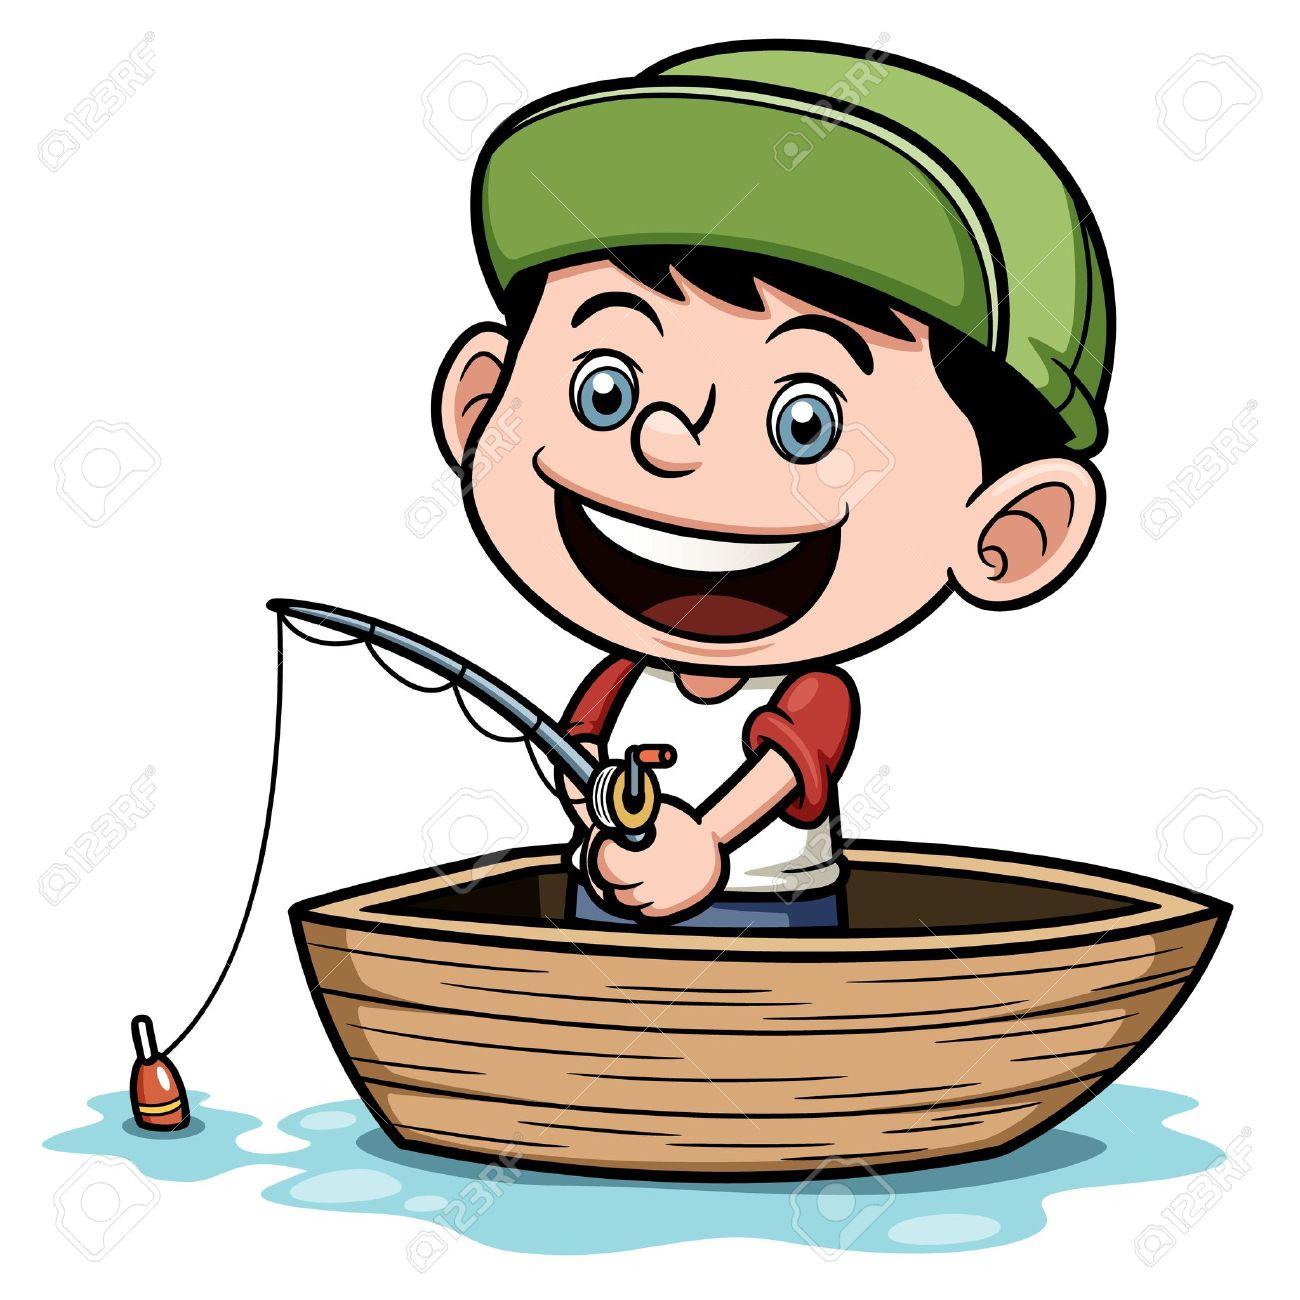 1300x1300 Illistration Clipart Boy Fishing